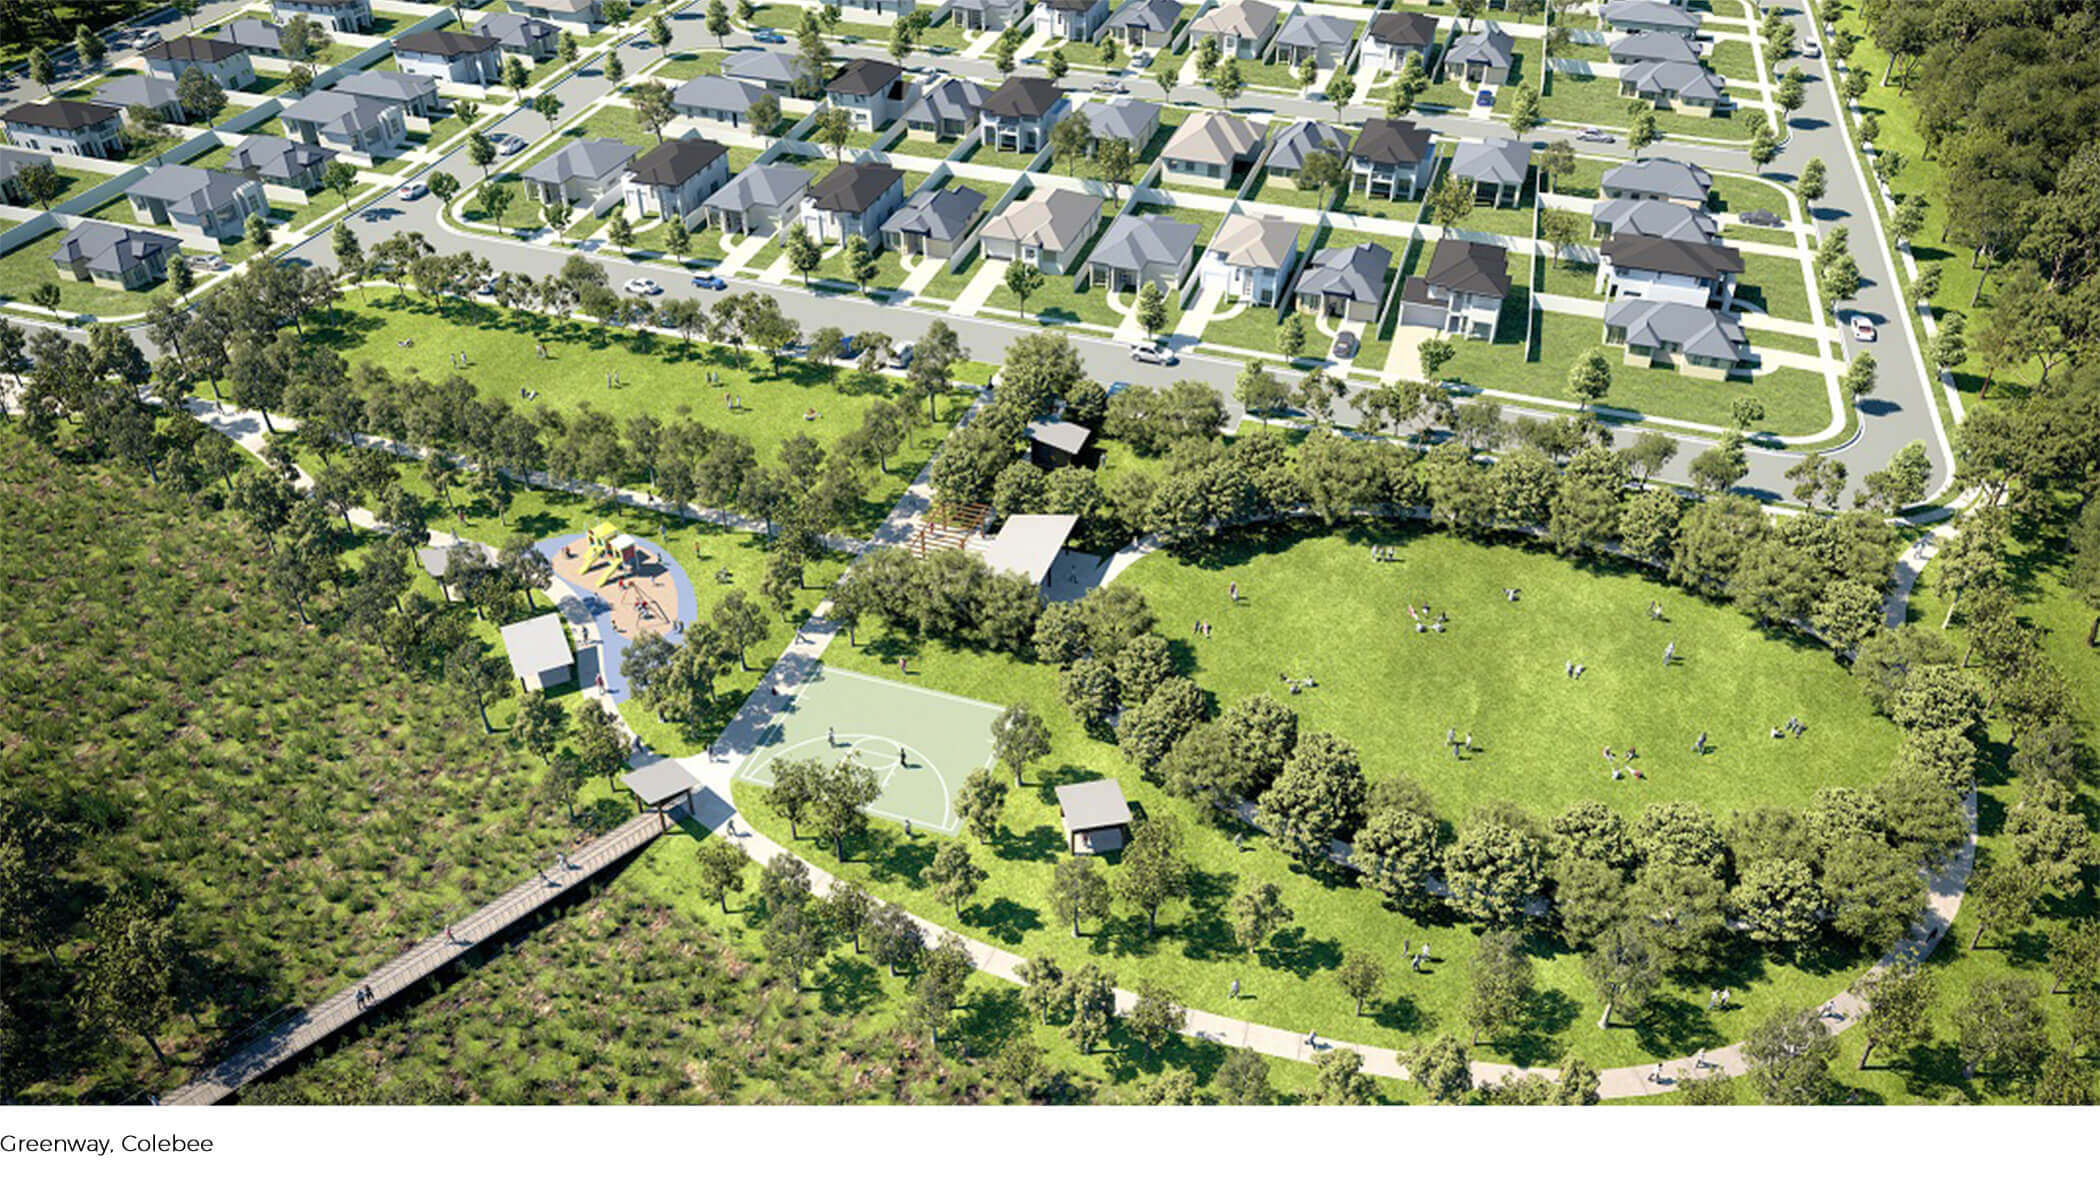 home-quest-hamlet-rosemeadow-property-developer-1-caption-3